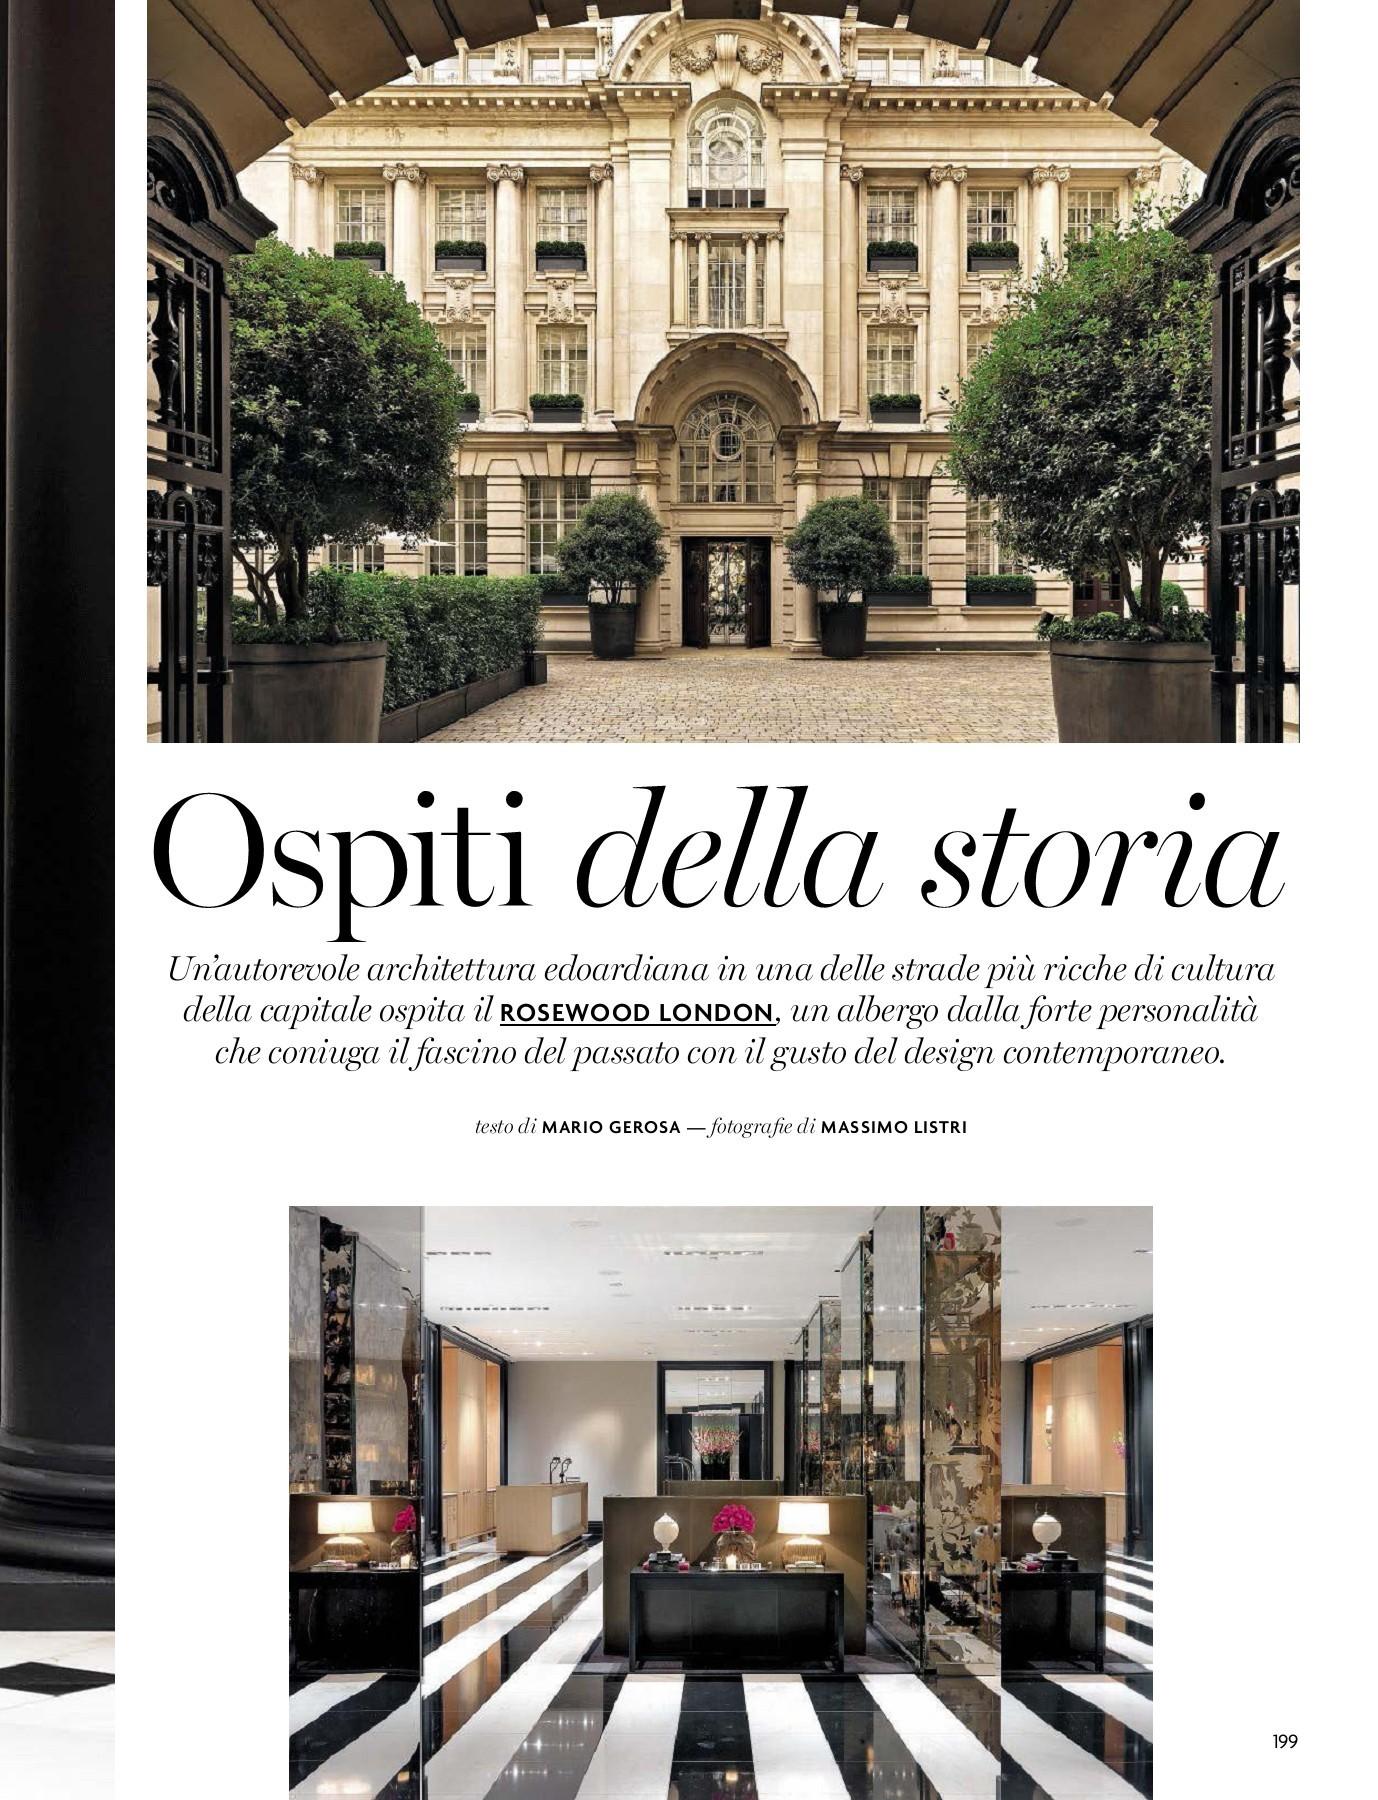 Di Tommaso Arredamenti Ostia architectural digest italia_oct 2017-flip book pages 201-229